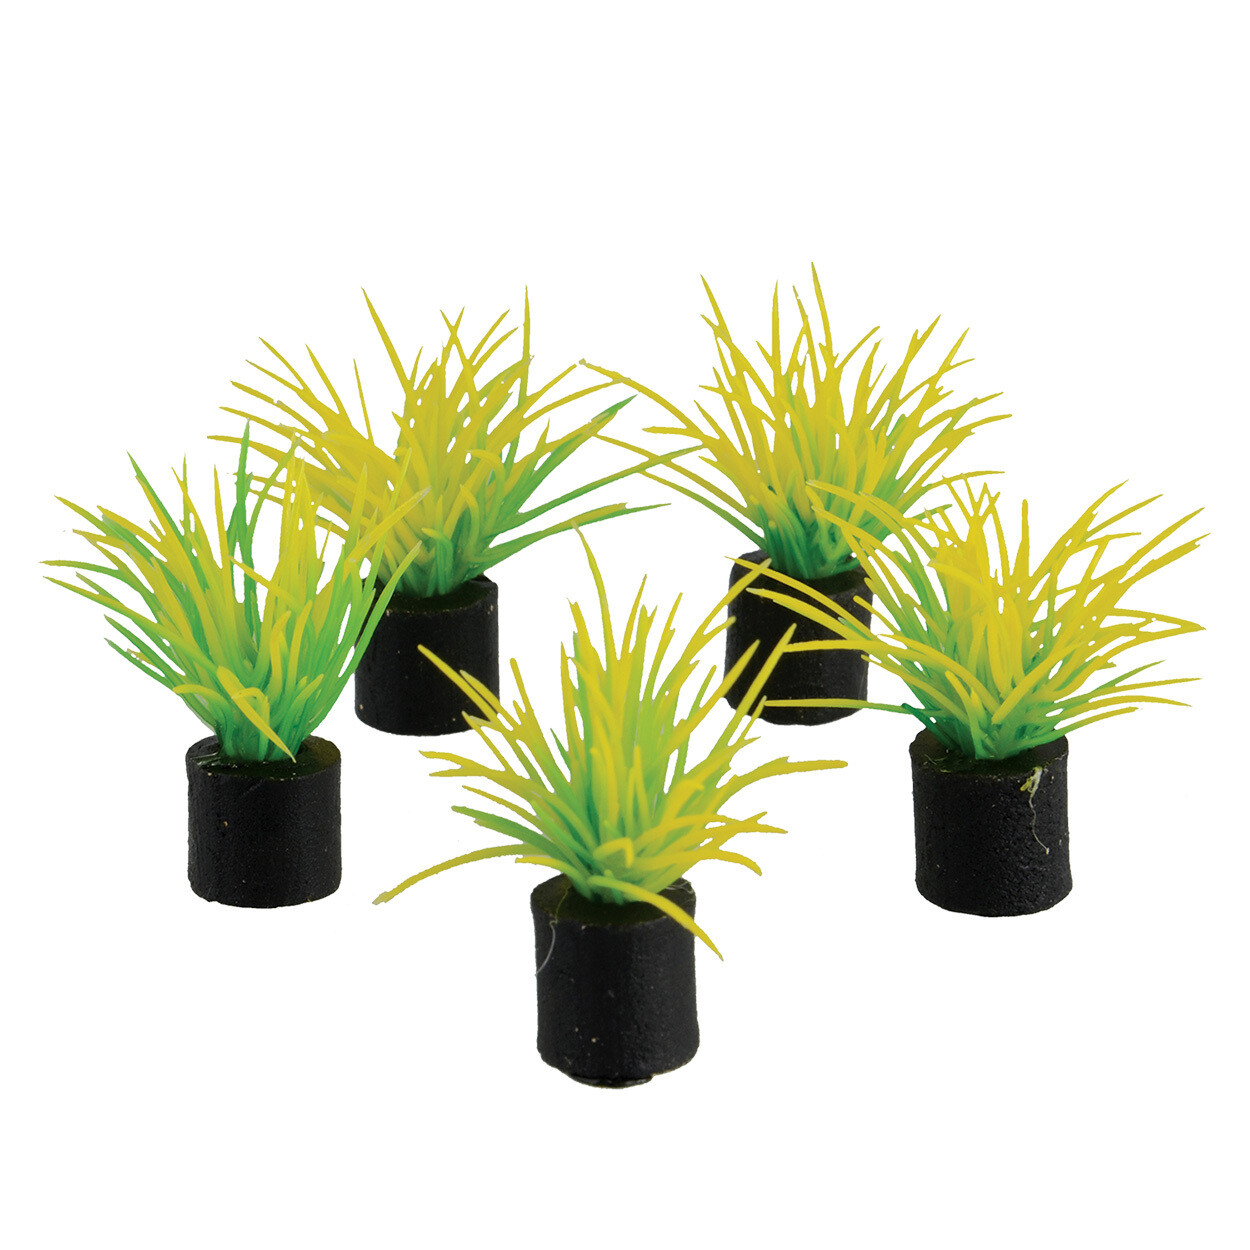 Underwater Treasures 5pk Mini Plant Spring Grass